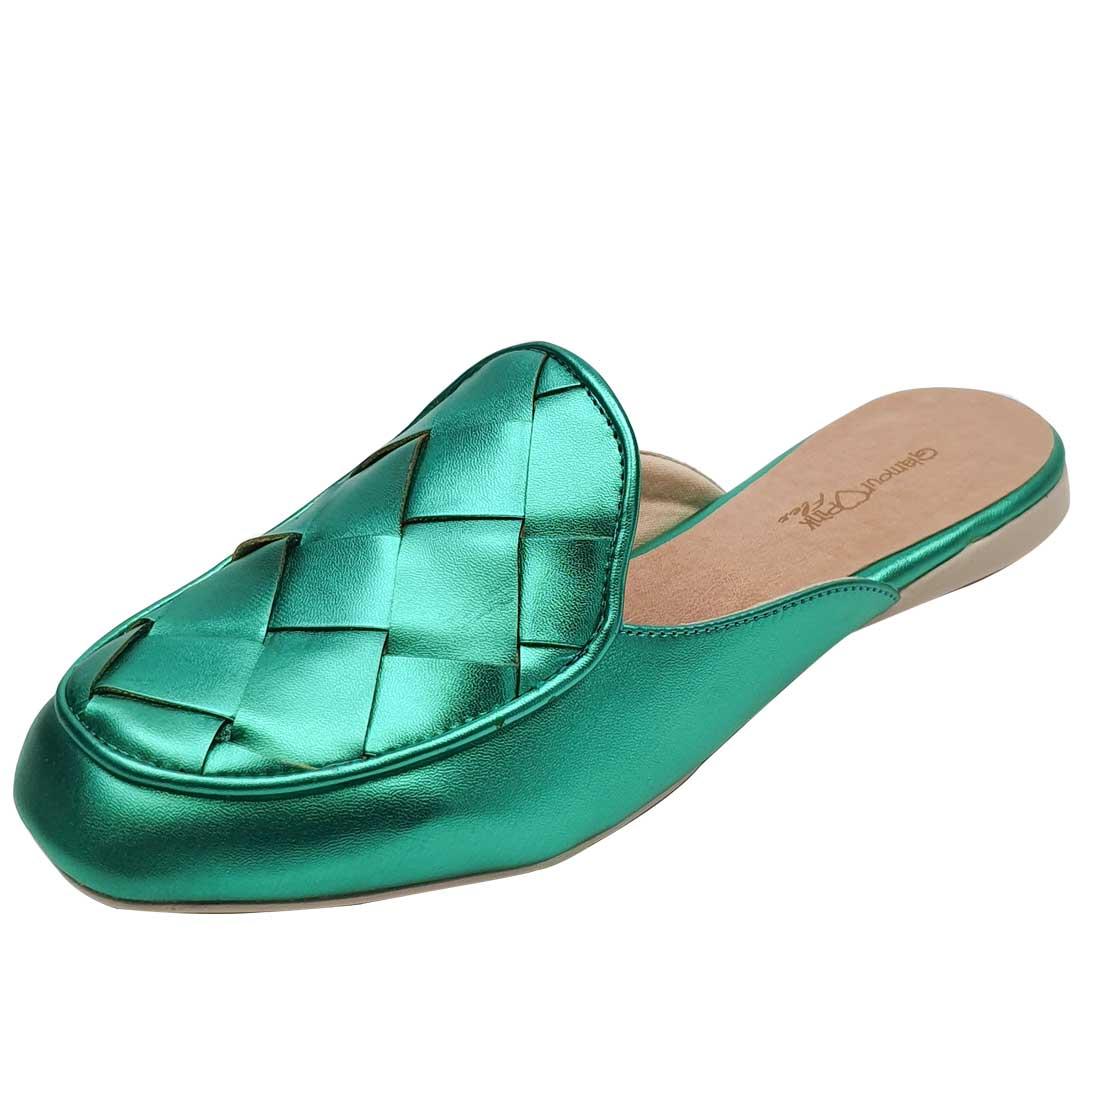 Mule Metalizada Trançada - Verde Esmeralda